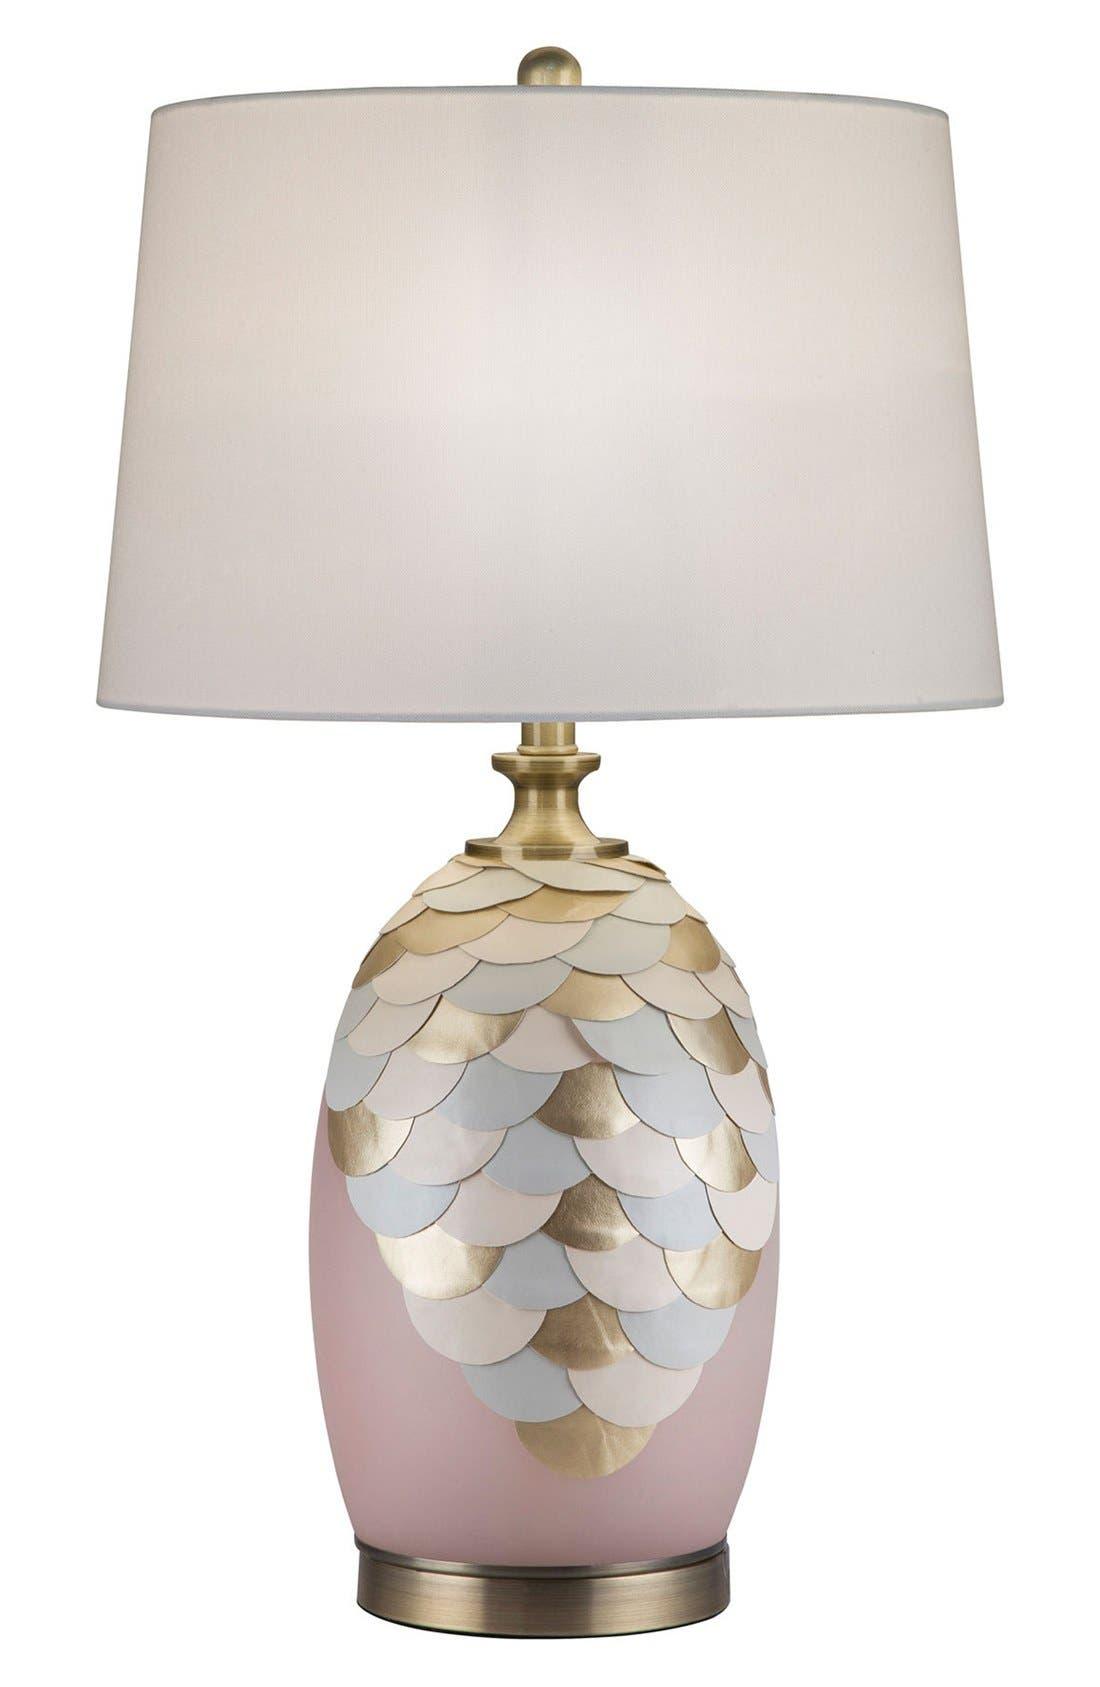 JAlexander Rose Quartz Table Lamp with Faux Leather & Brass Accents,                             Main thumbnail 1, color,                             650